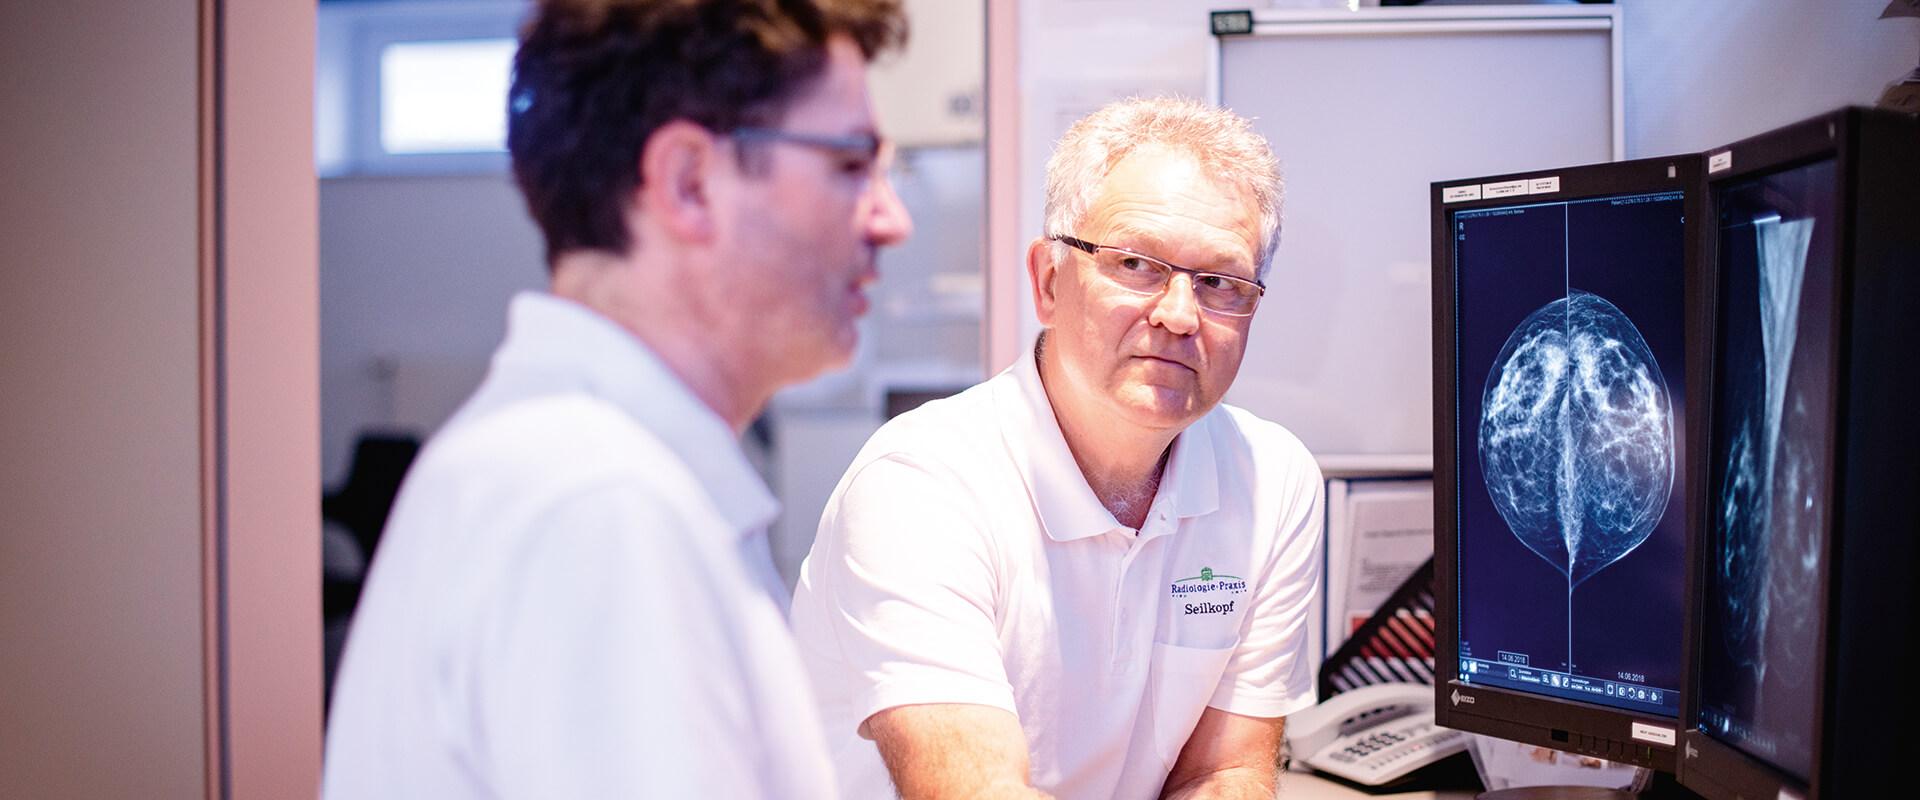 Radiologie Bayreuth